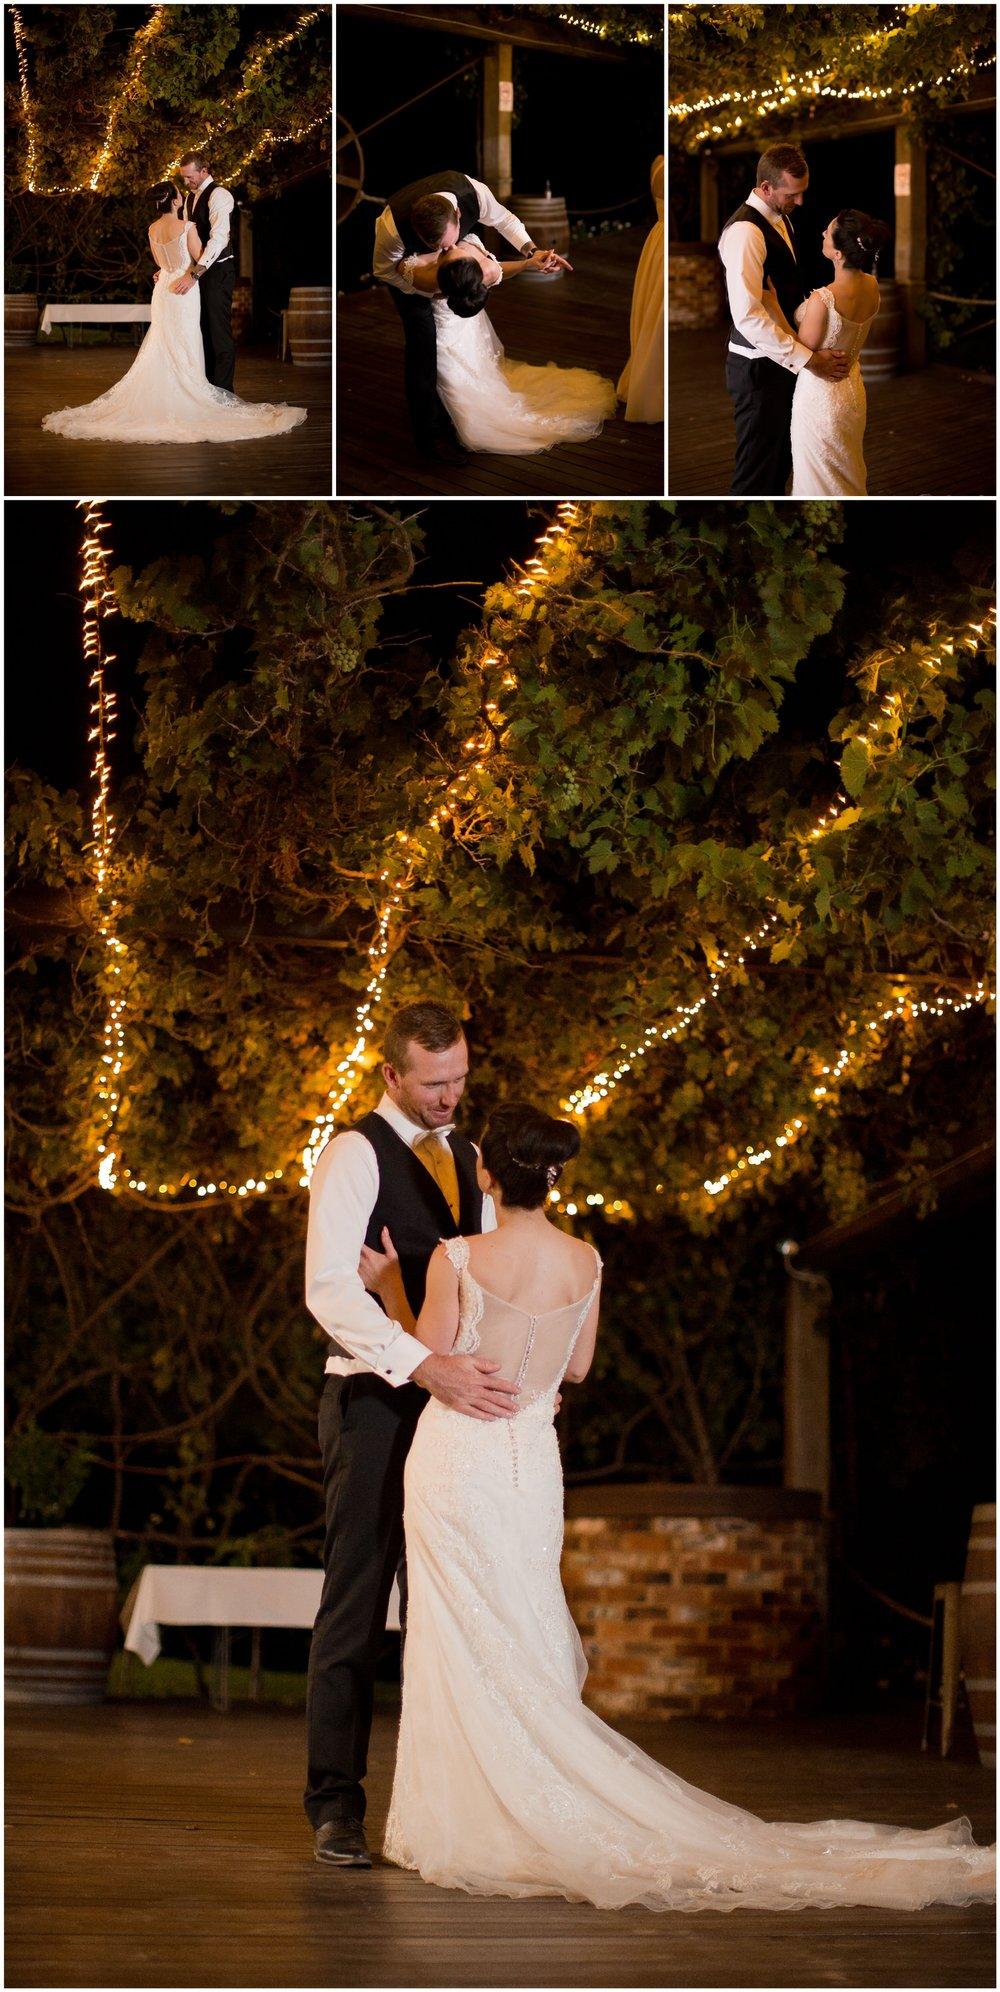 Dubbo Wedding Photography - Lazy River Estate Wedding 25